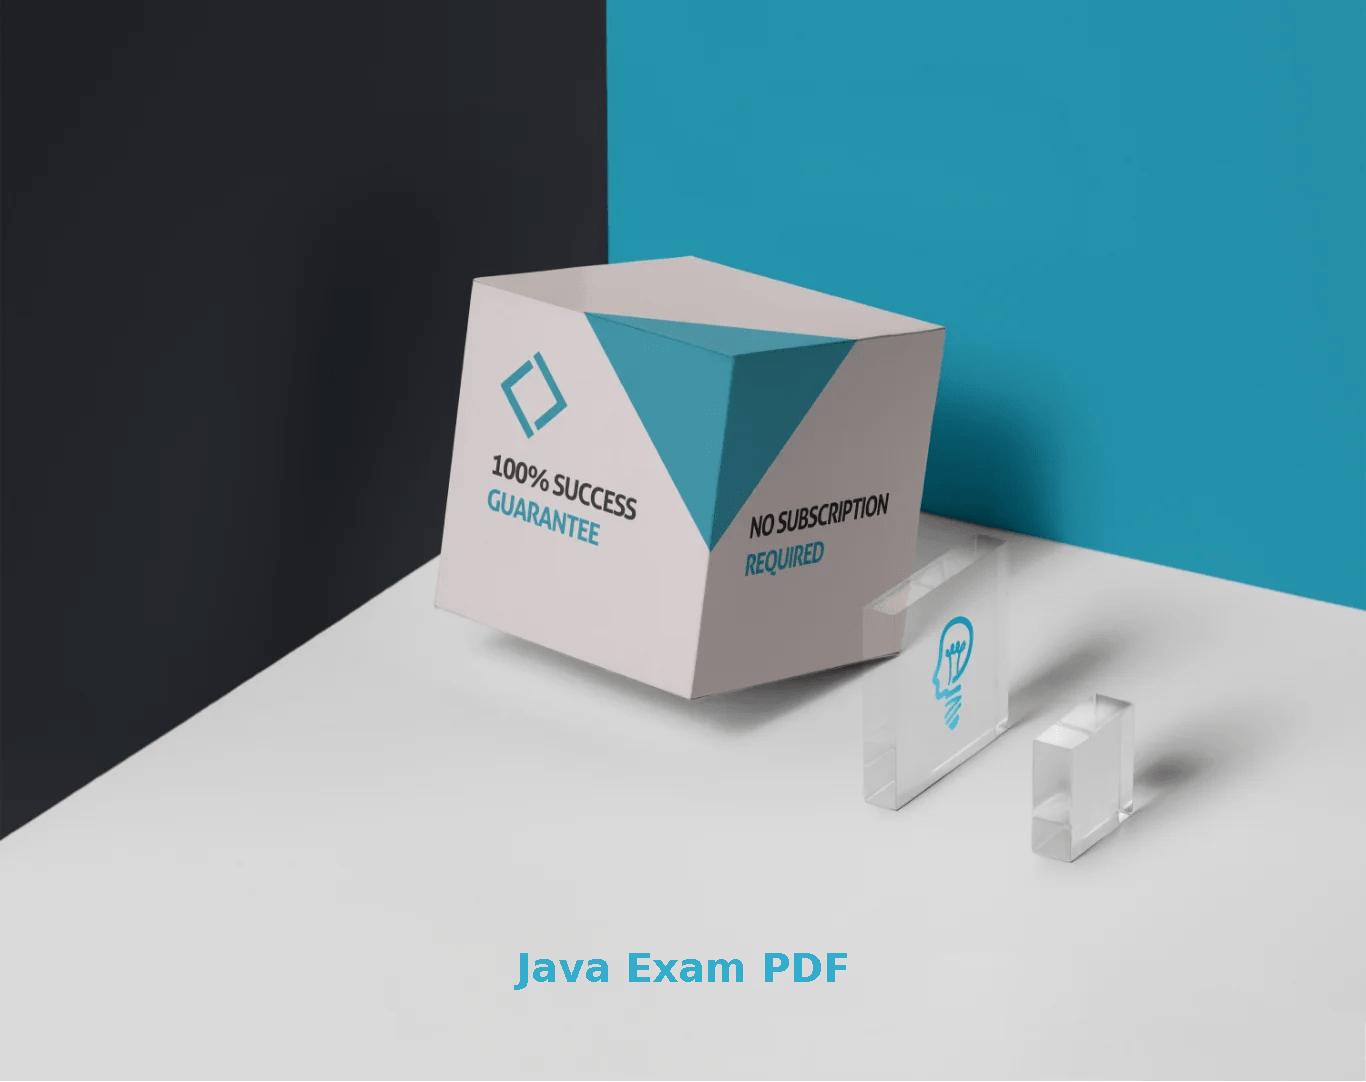 Java Exam PDF